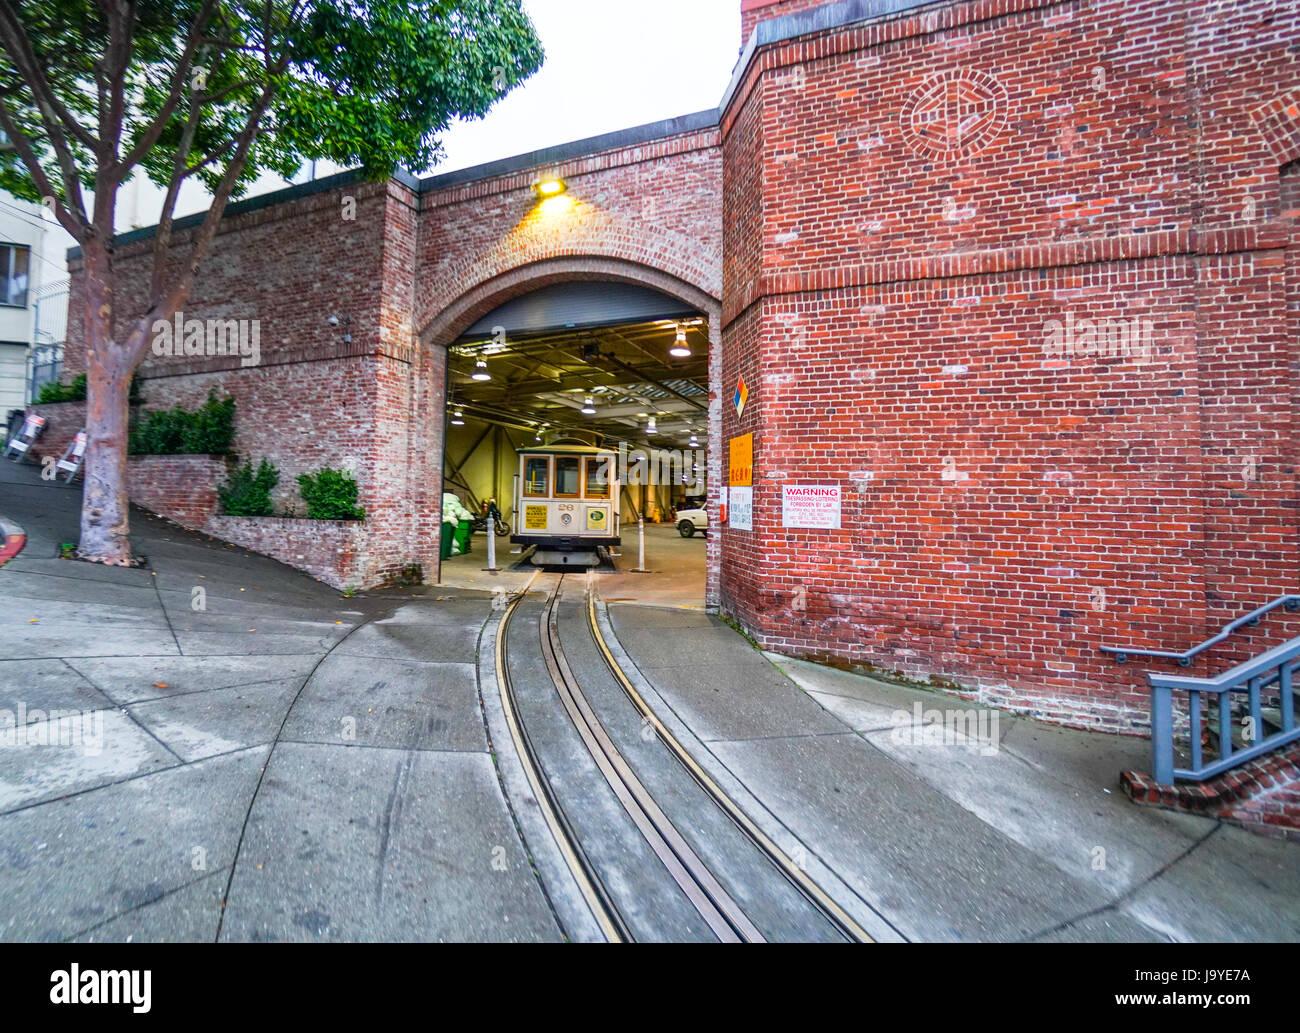 Kabel PKW Garage Und Museum In San Francisco   SAN FRANCISCO   CALIFORNIA